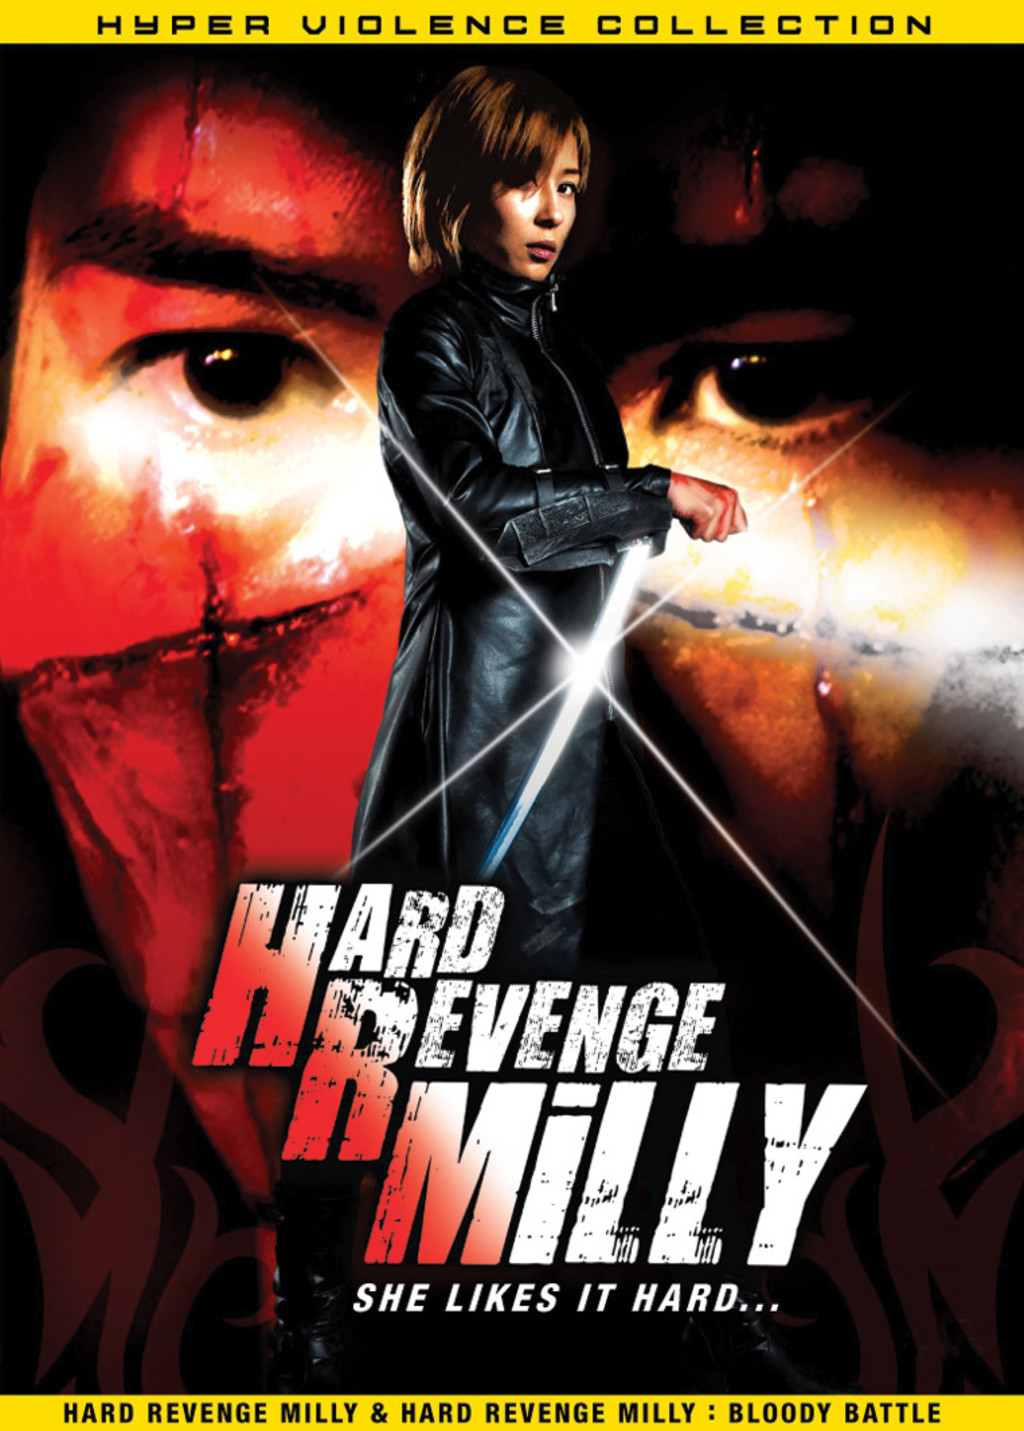 watch hard revenge milly bloody battle on netflix today